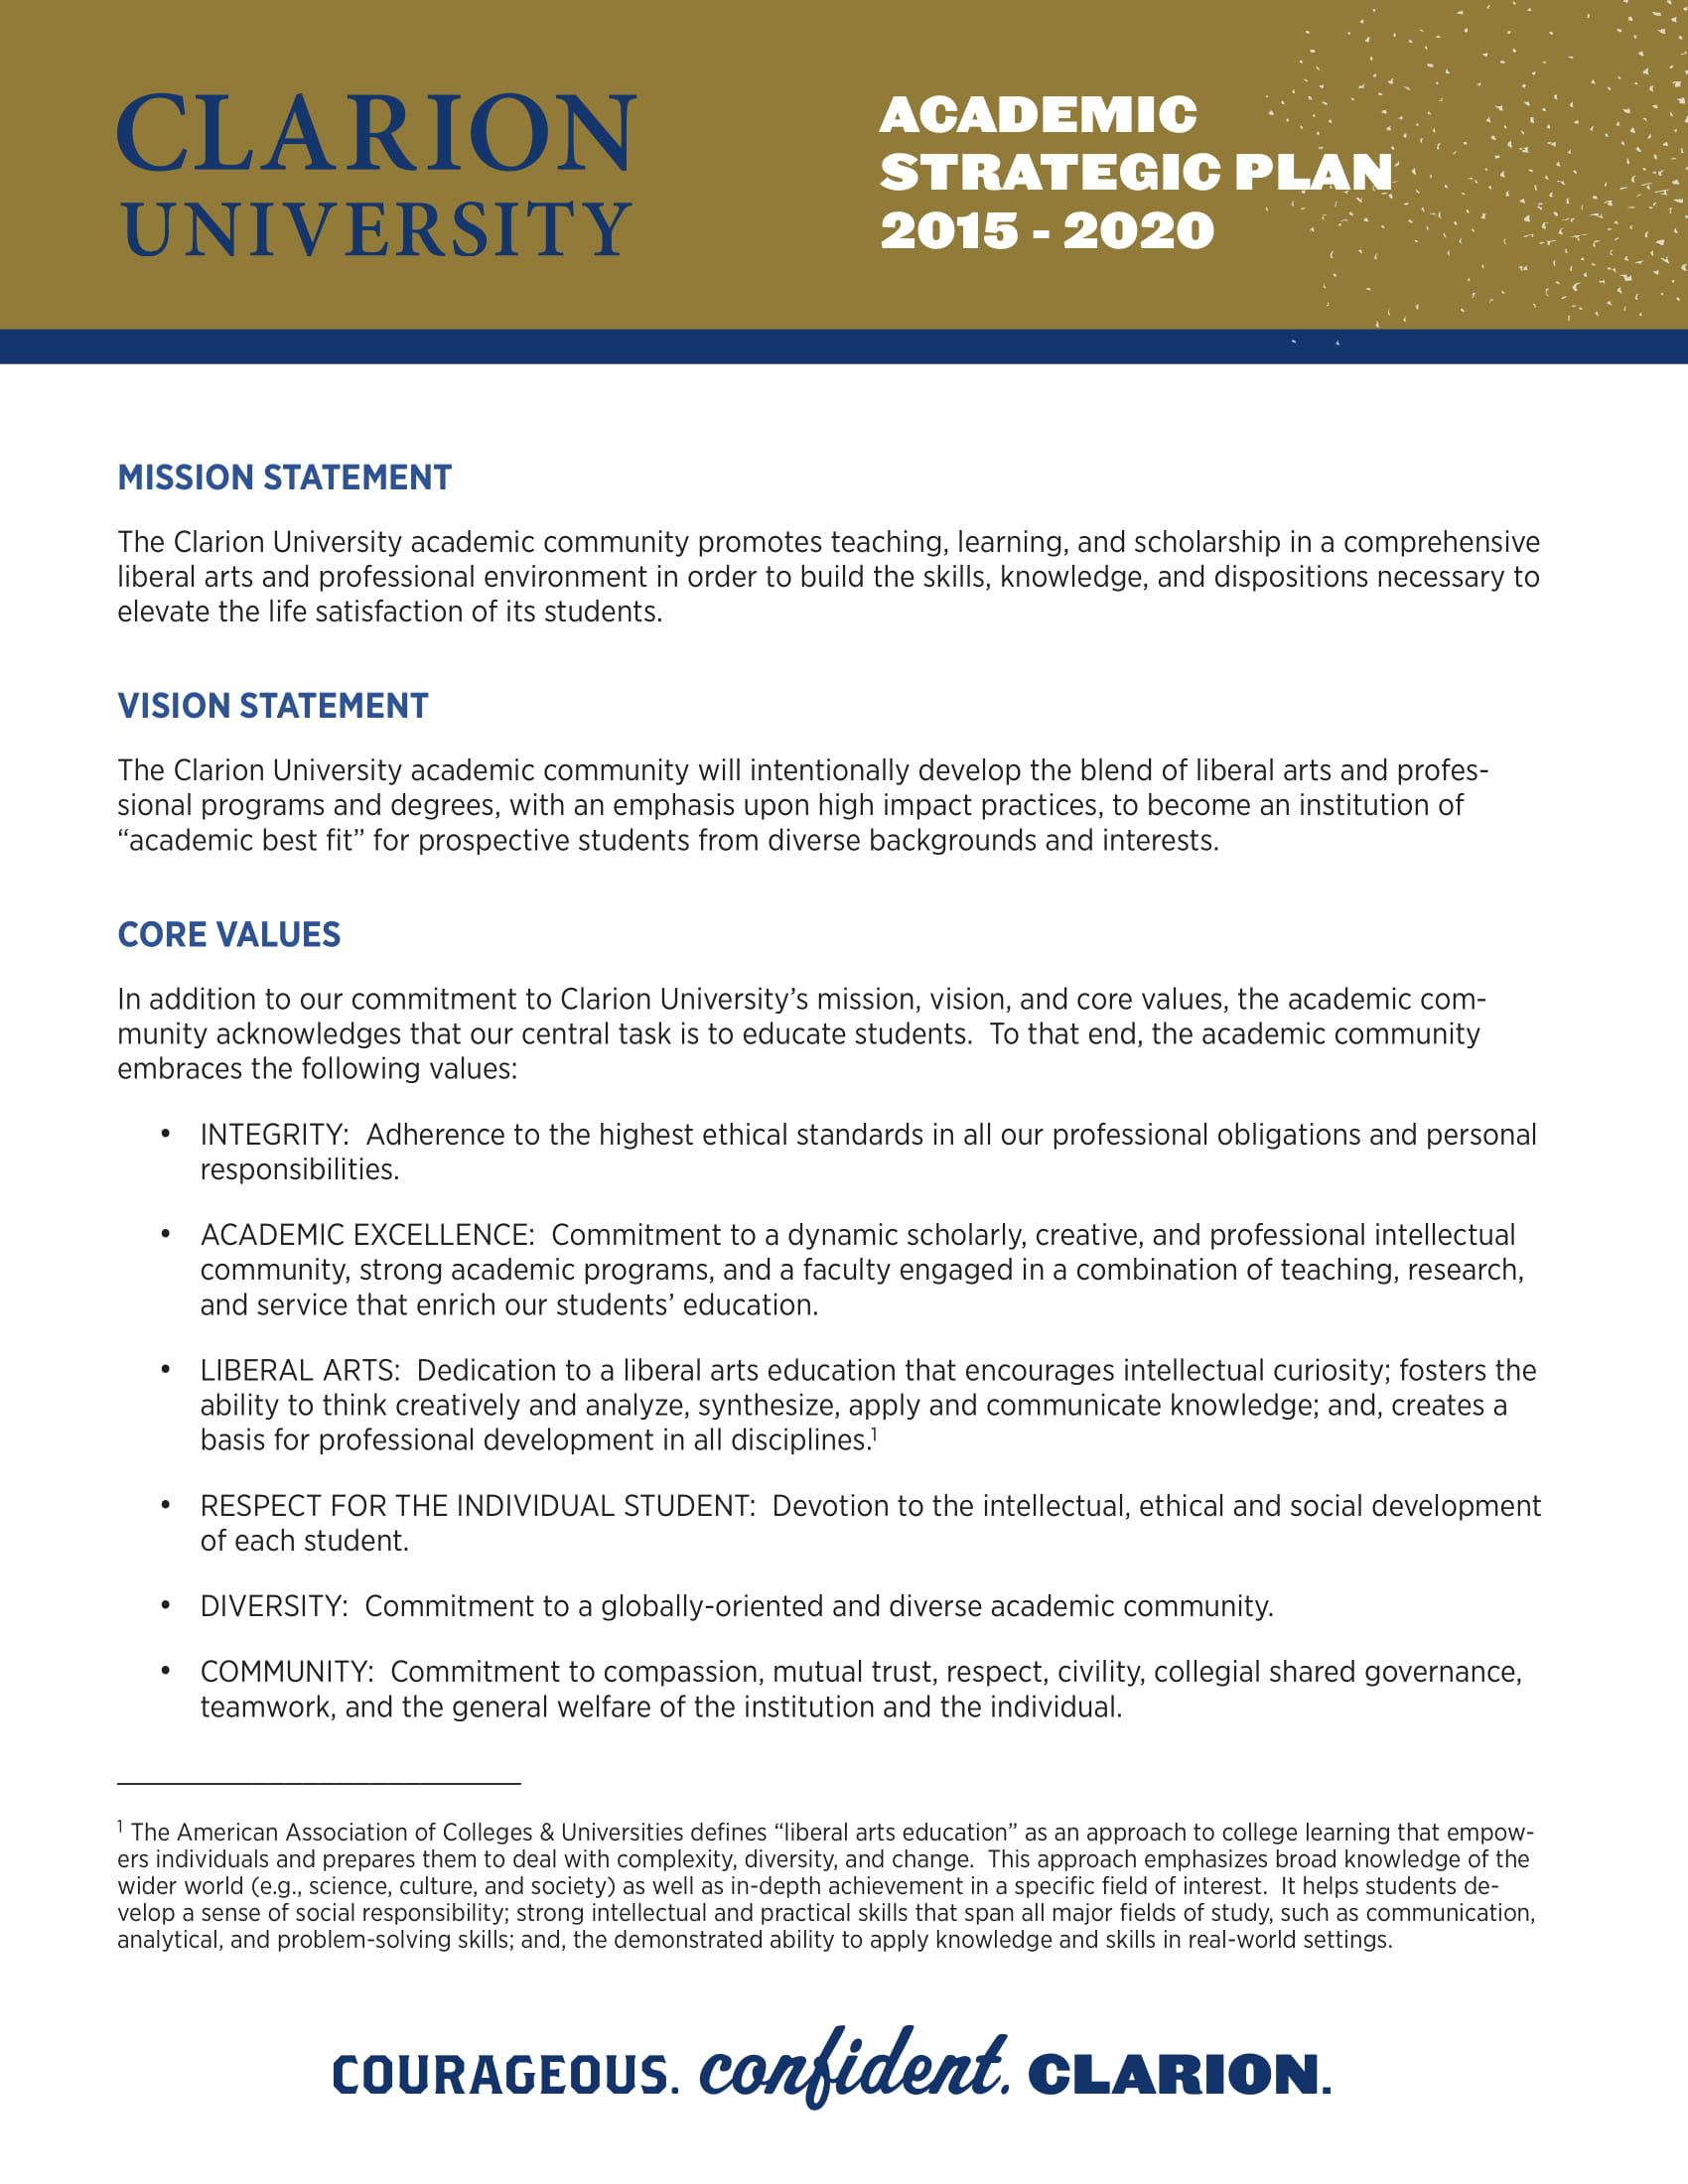 clarion academic strategic plan